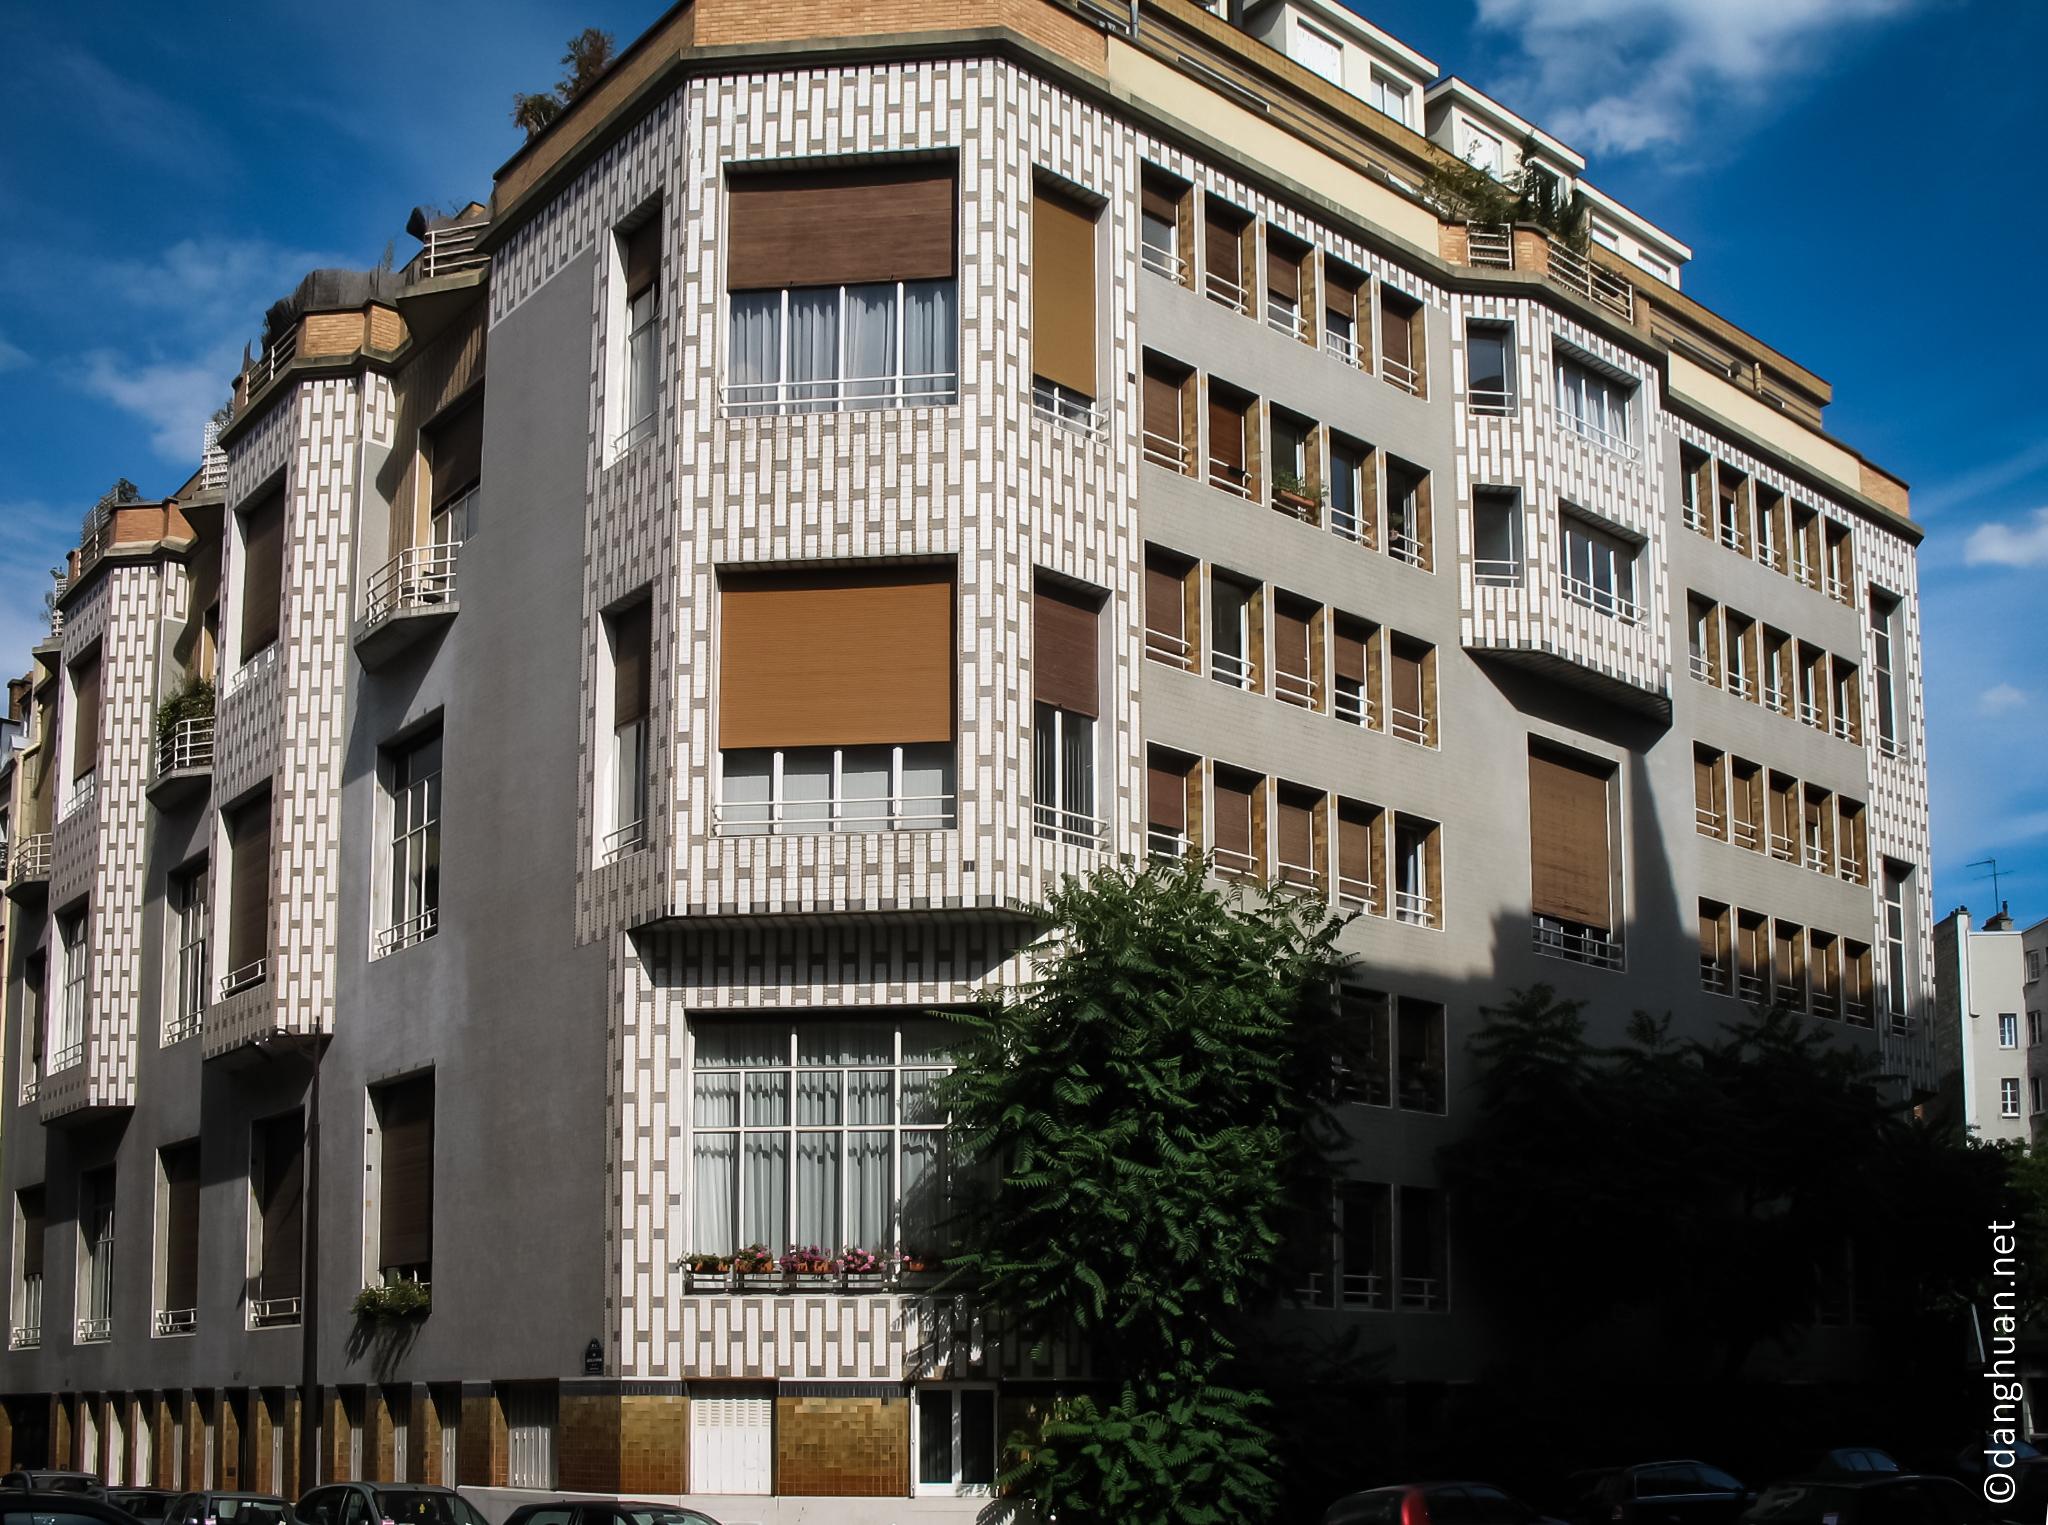 Architecte : Henri Sauvage - 65 Rue de la Fontaine - 1926